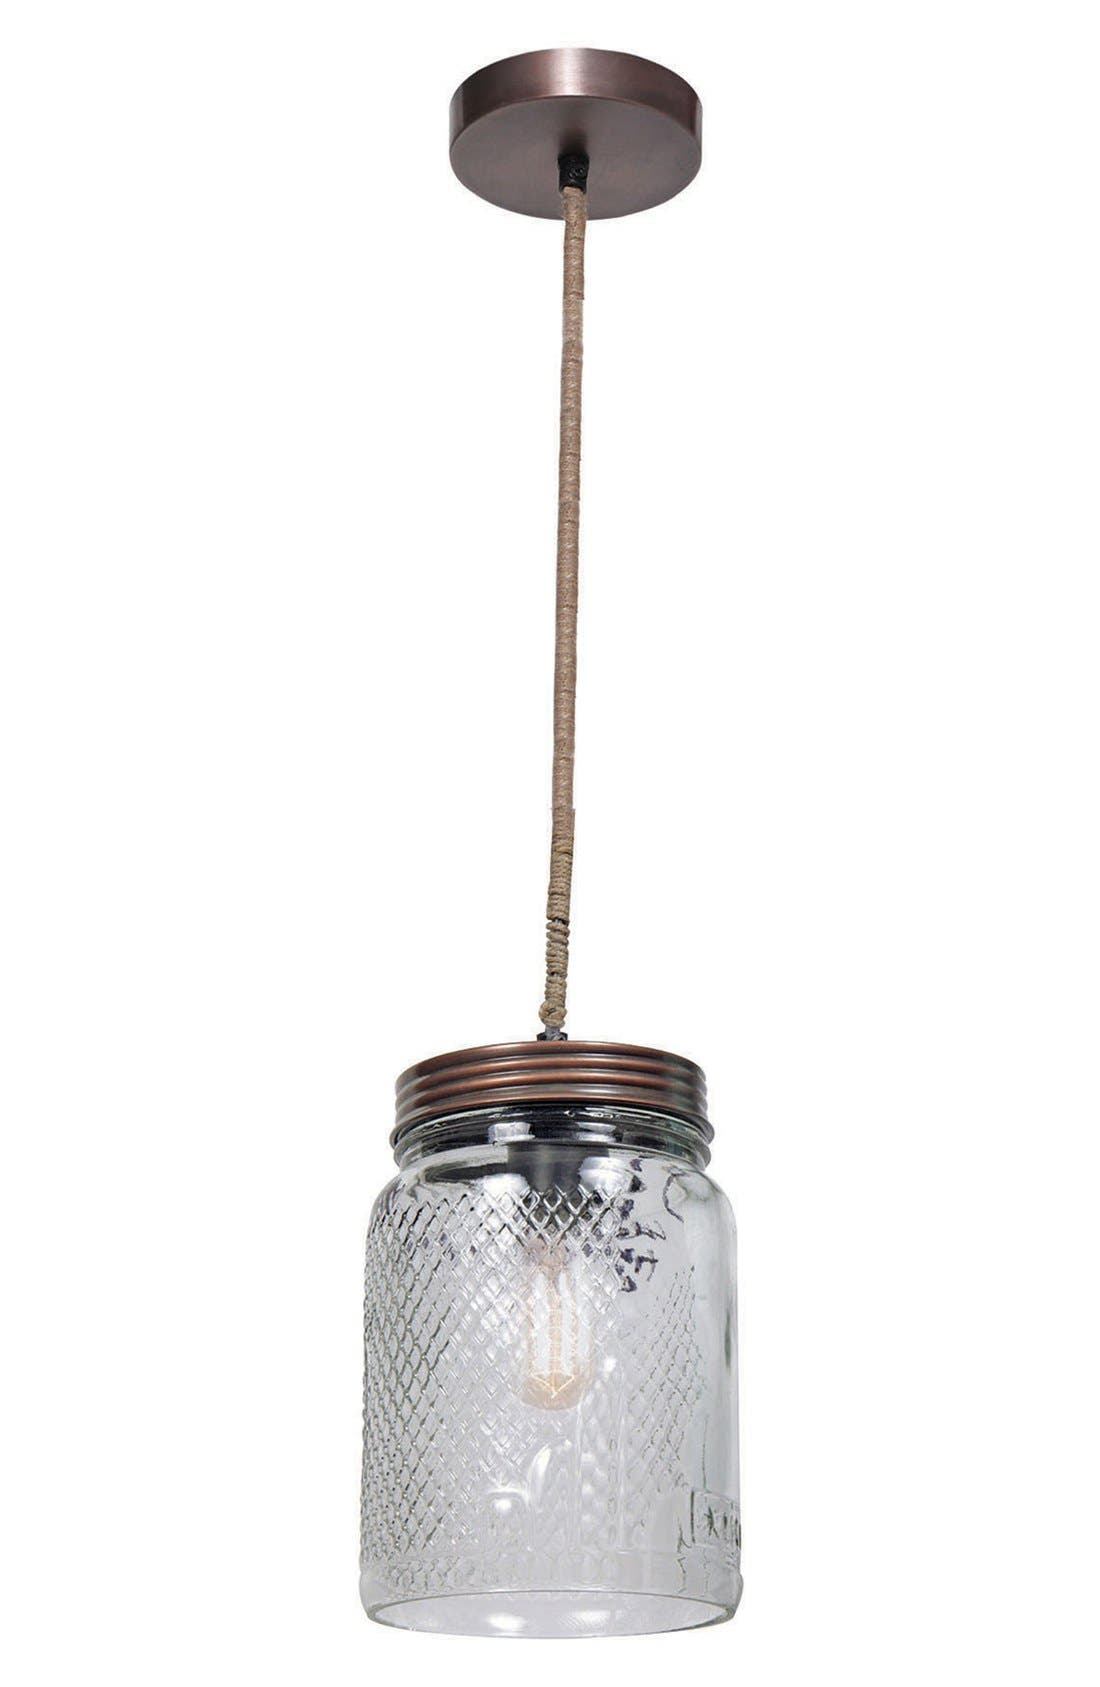 'Mason Jar' Ceiling Light Fixture,                         Main,                         color,